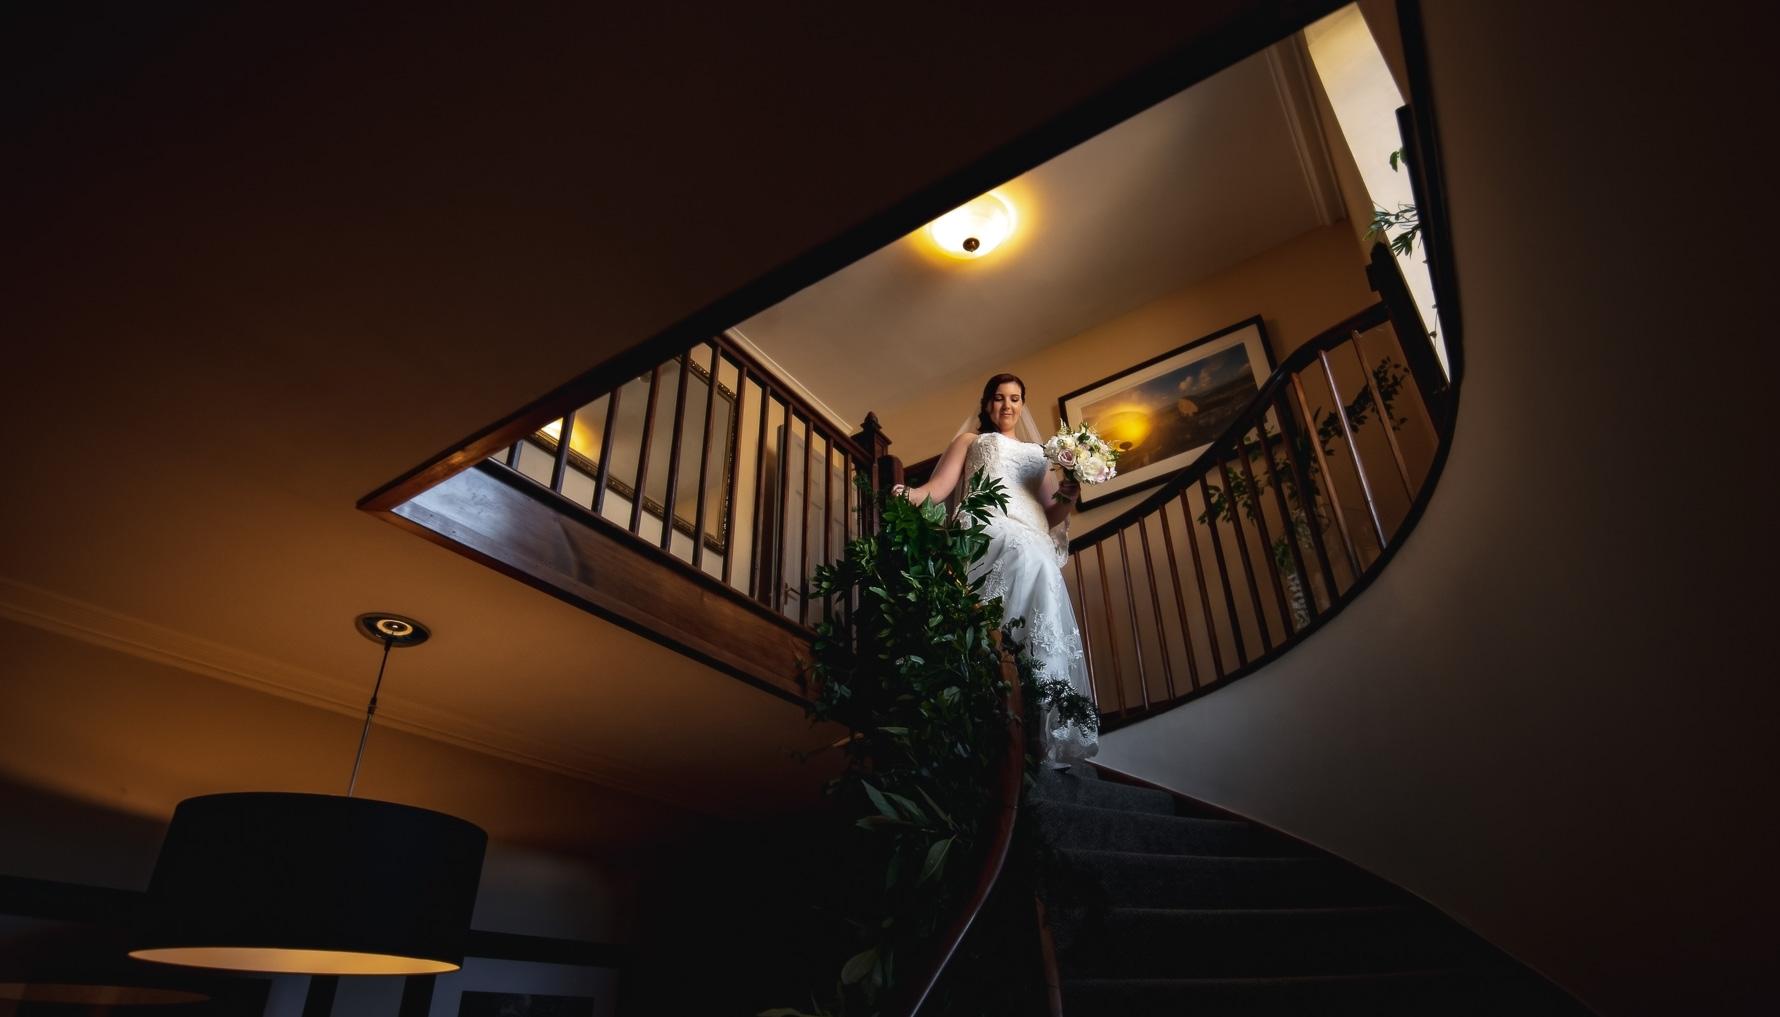 Bride-to-be descending staircase